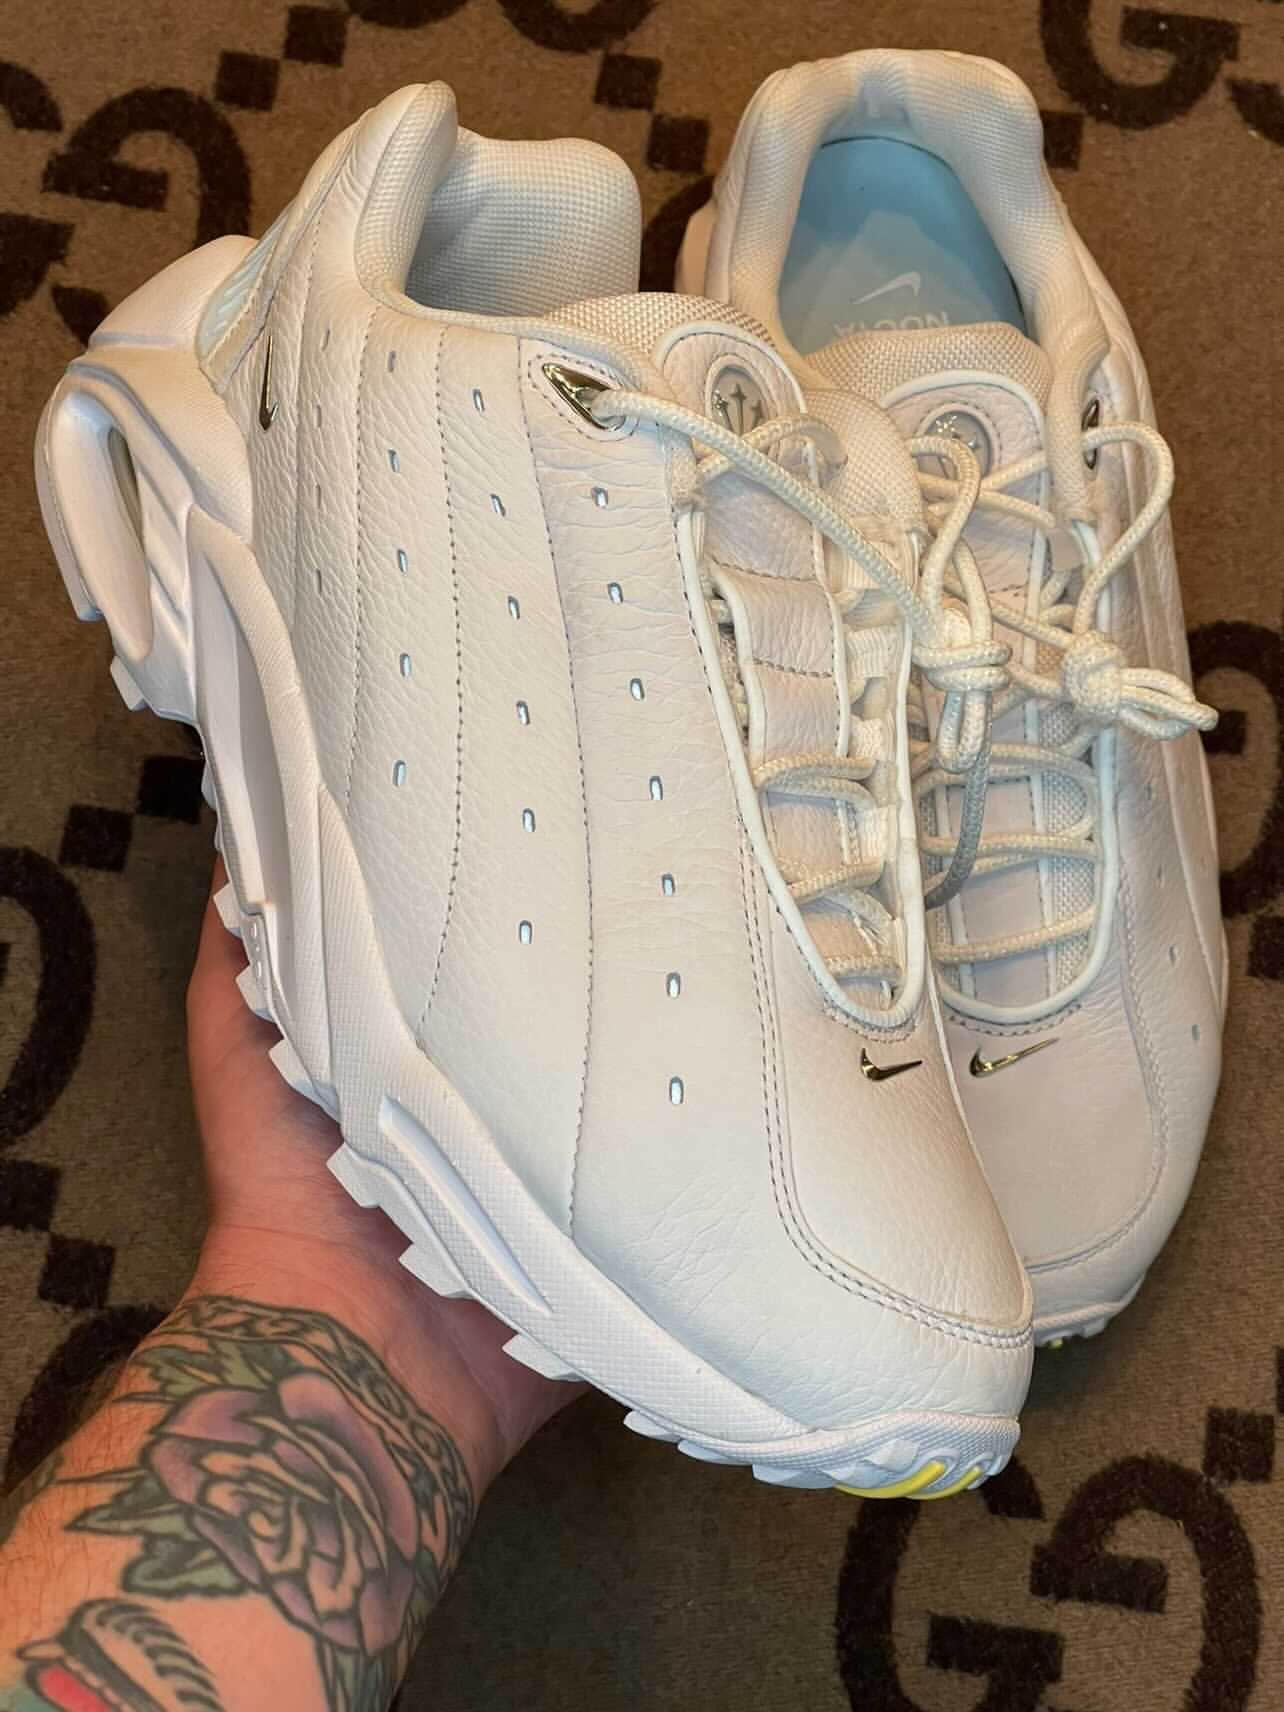 NOCTA x Nike Hot Step Air Terra实物曝光!这双小白鞋可以冲! 货号:DH4692-100